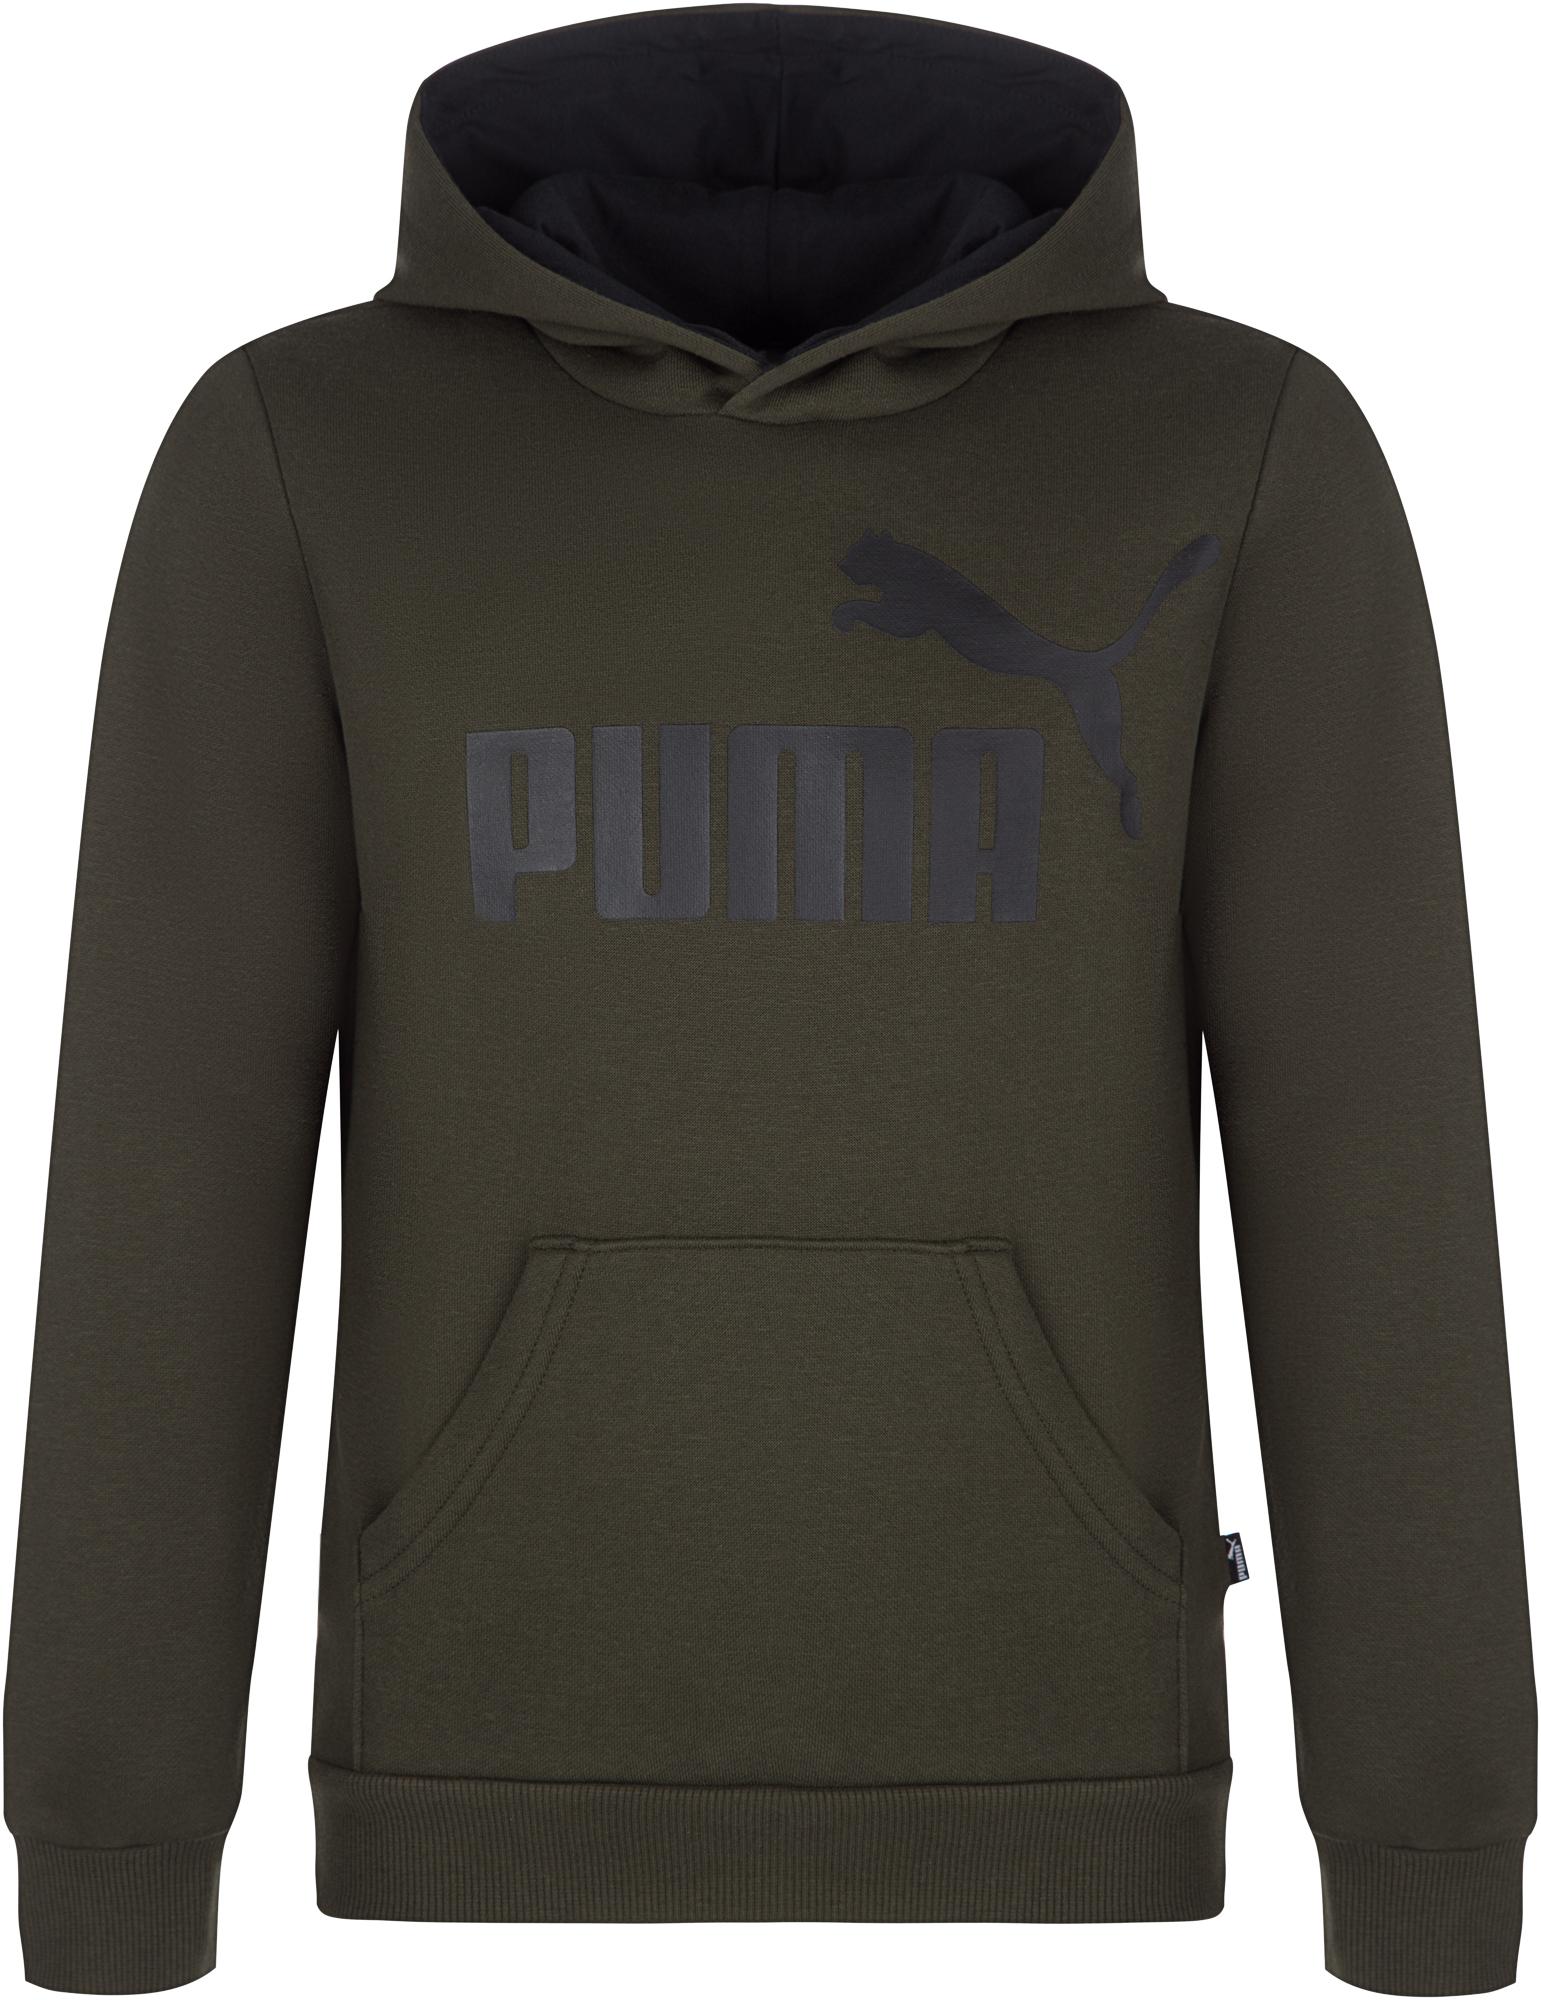 Puma Худи для мальчиков Puma, размер 164 puma джемпер для мальчиков puma evostripe fz размер 164